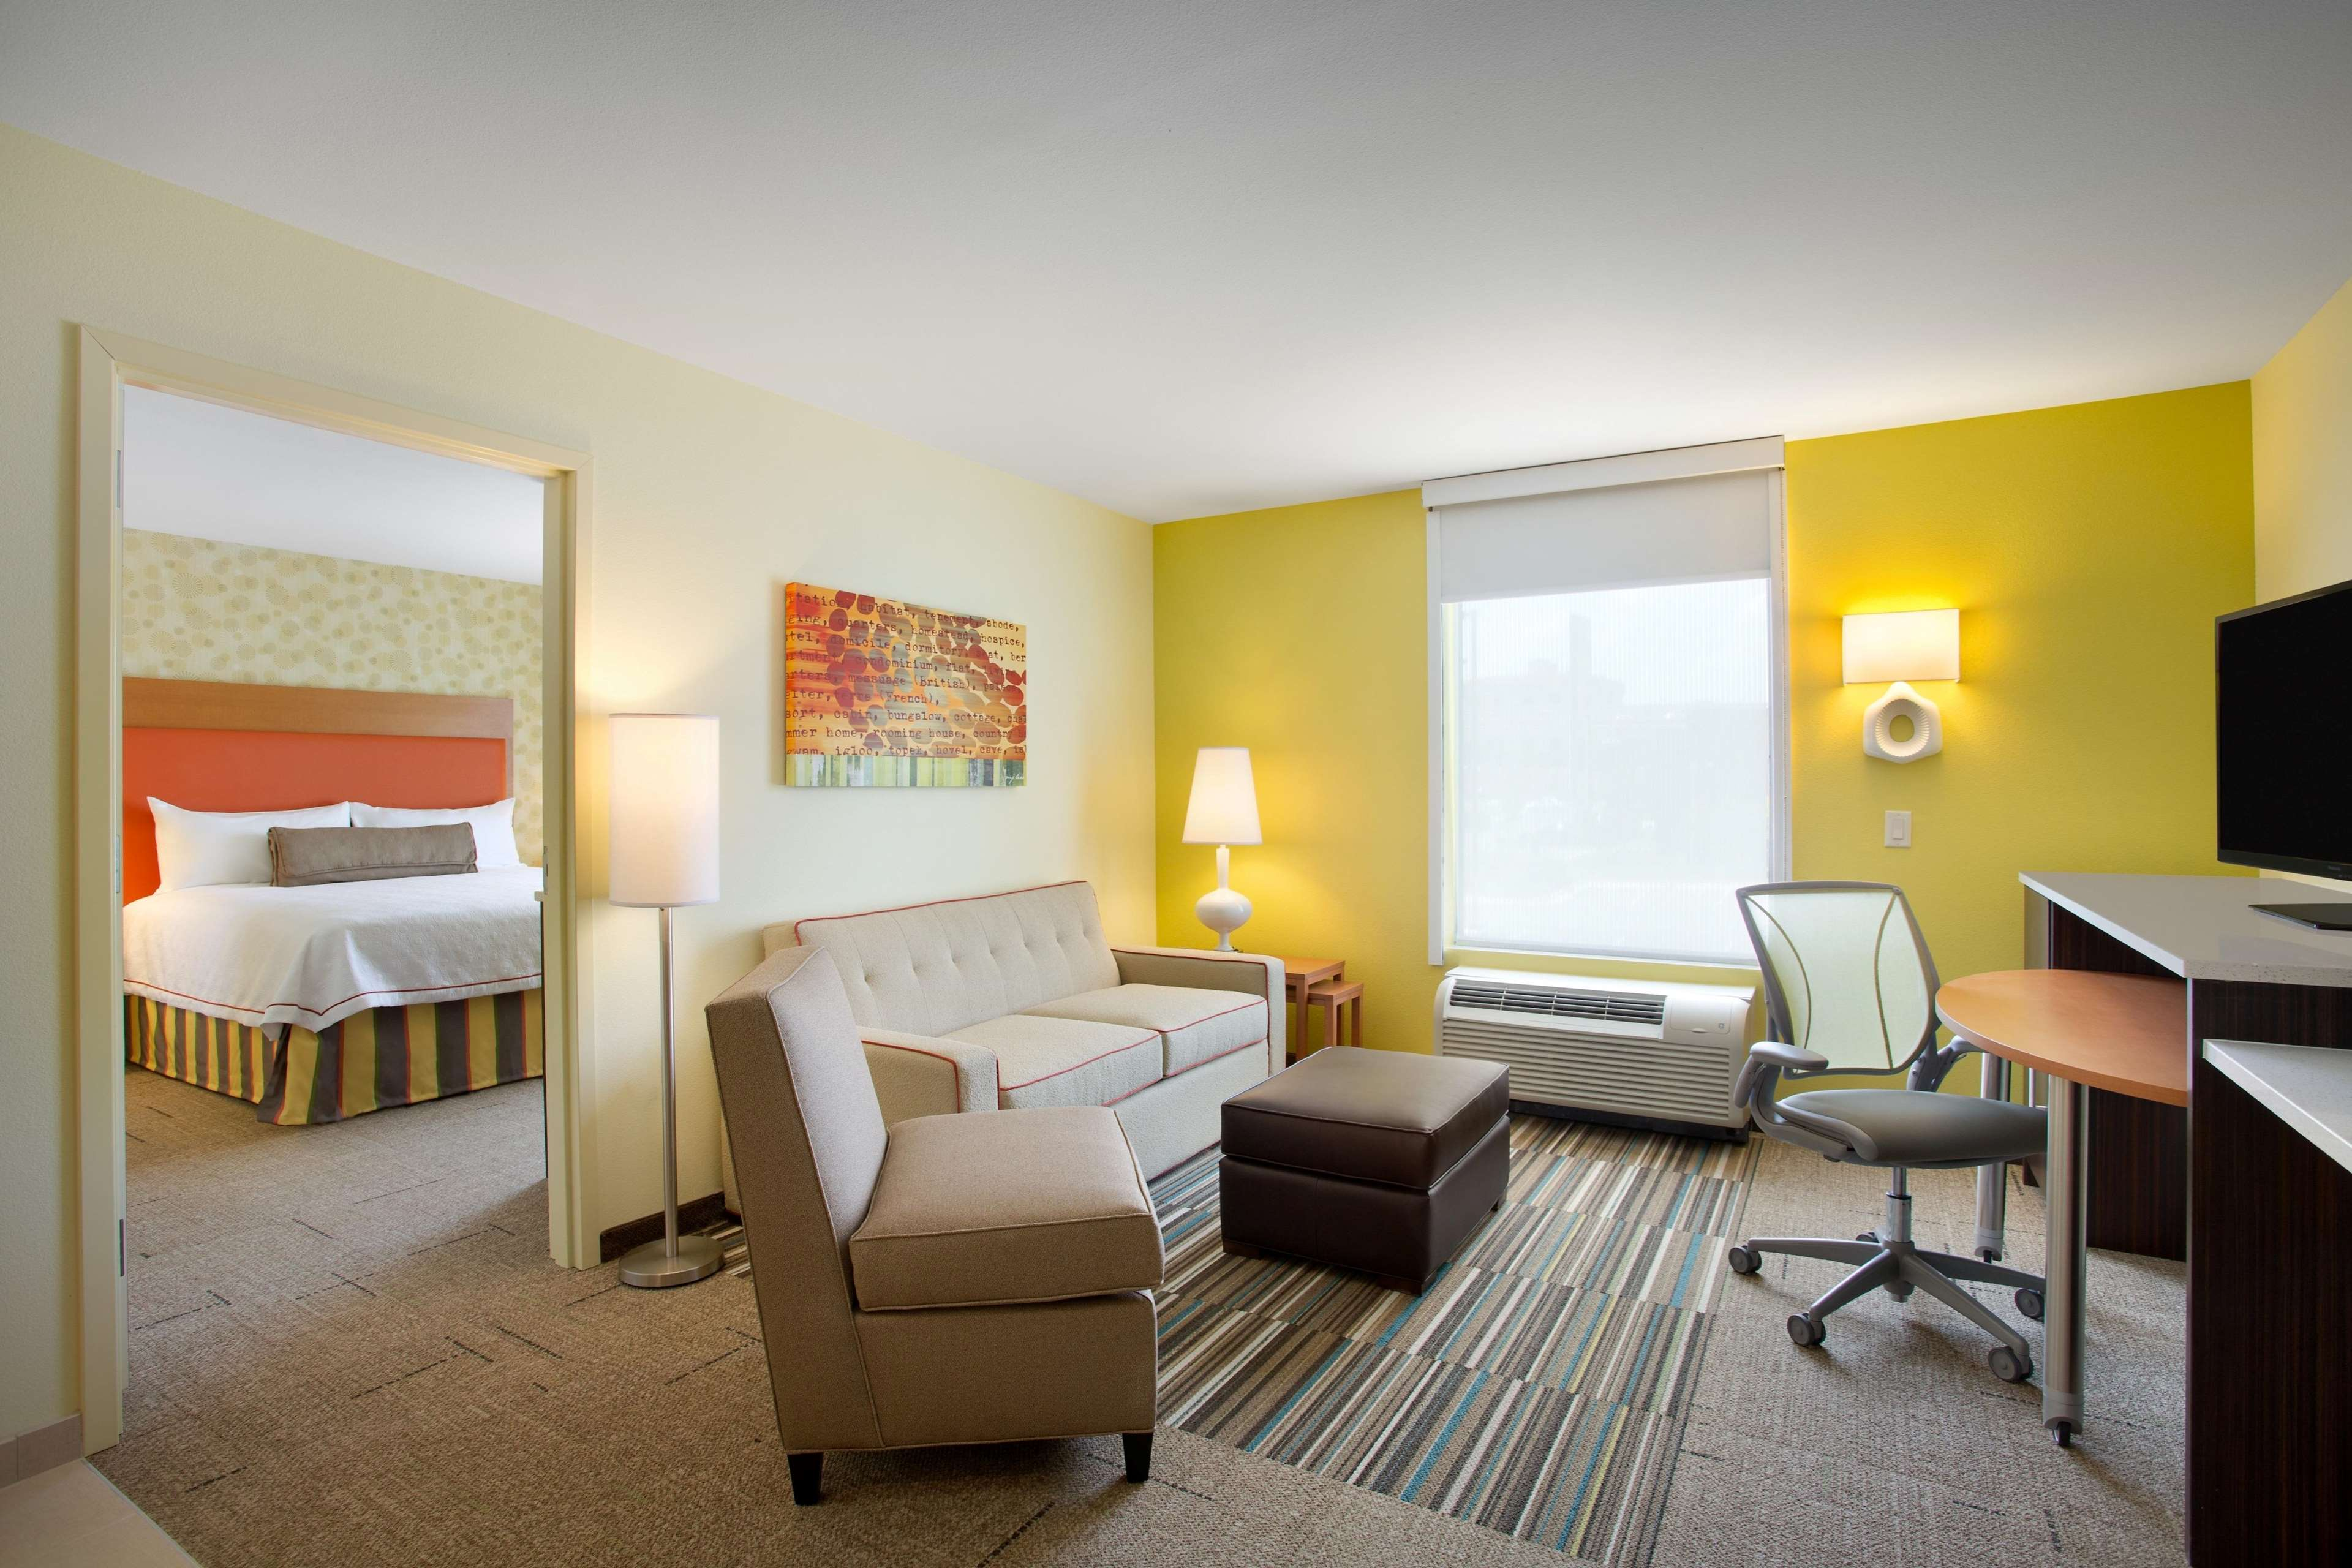 Home2 Suites by Hilton San Antonio Airport, TX image 18